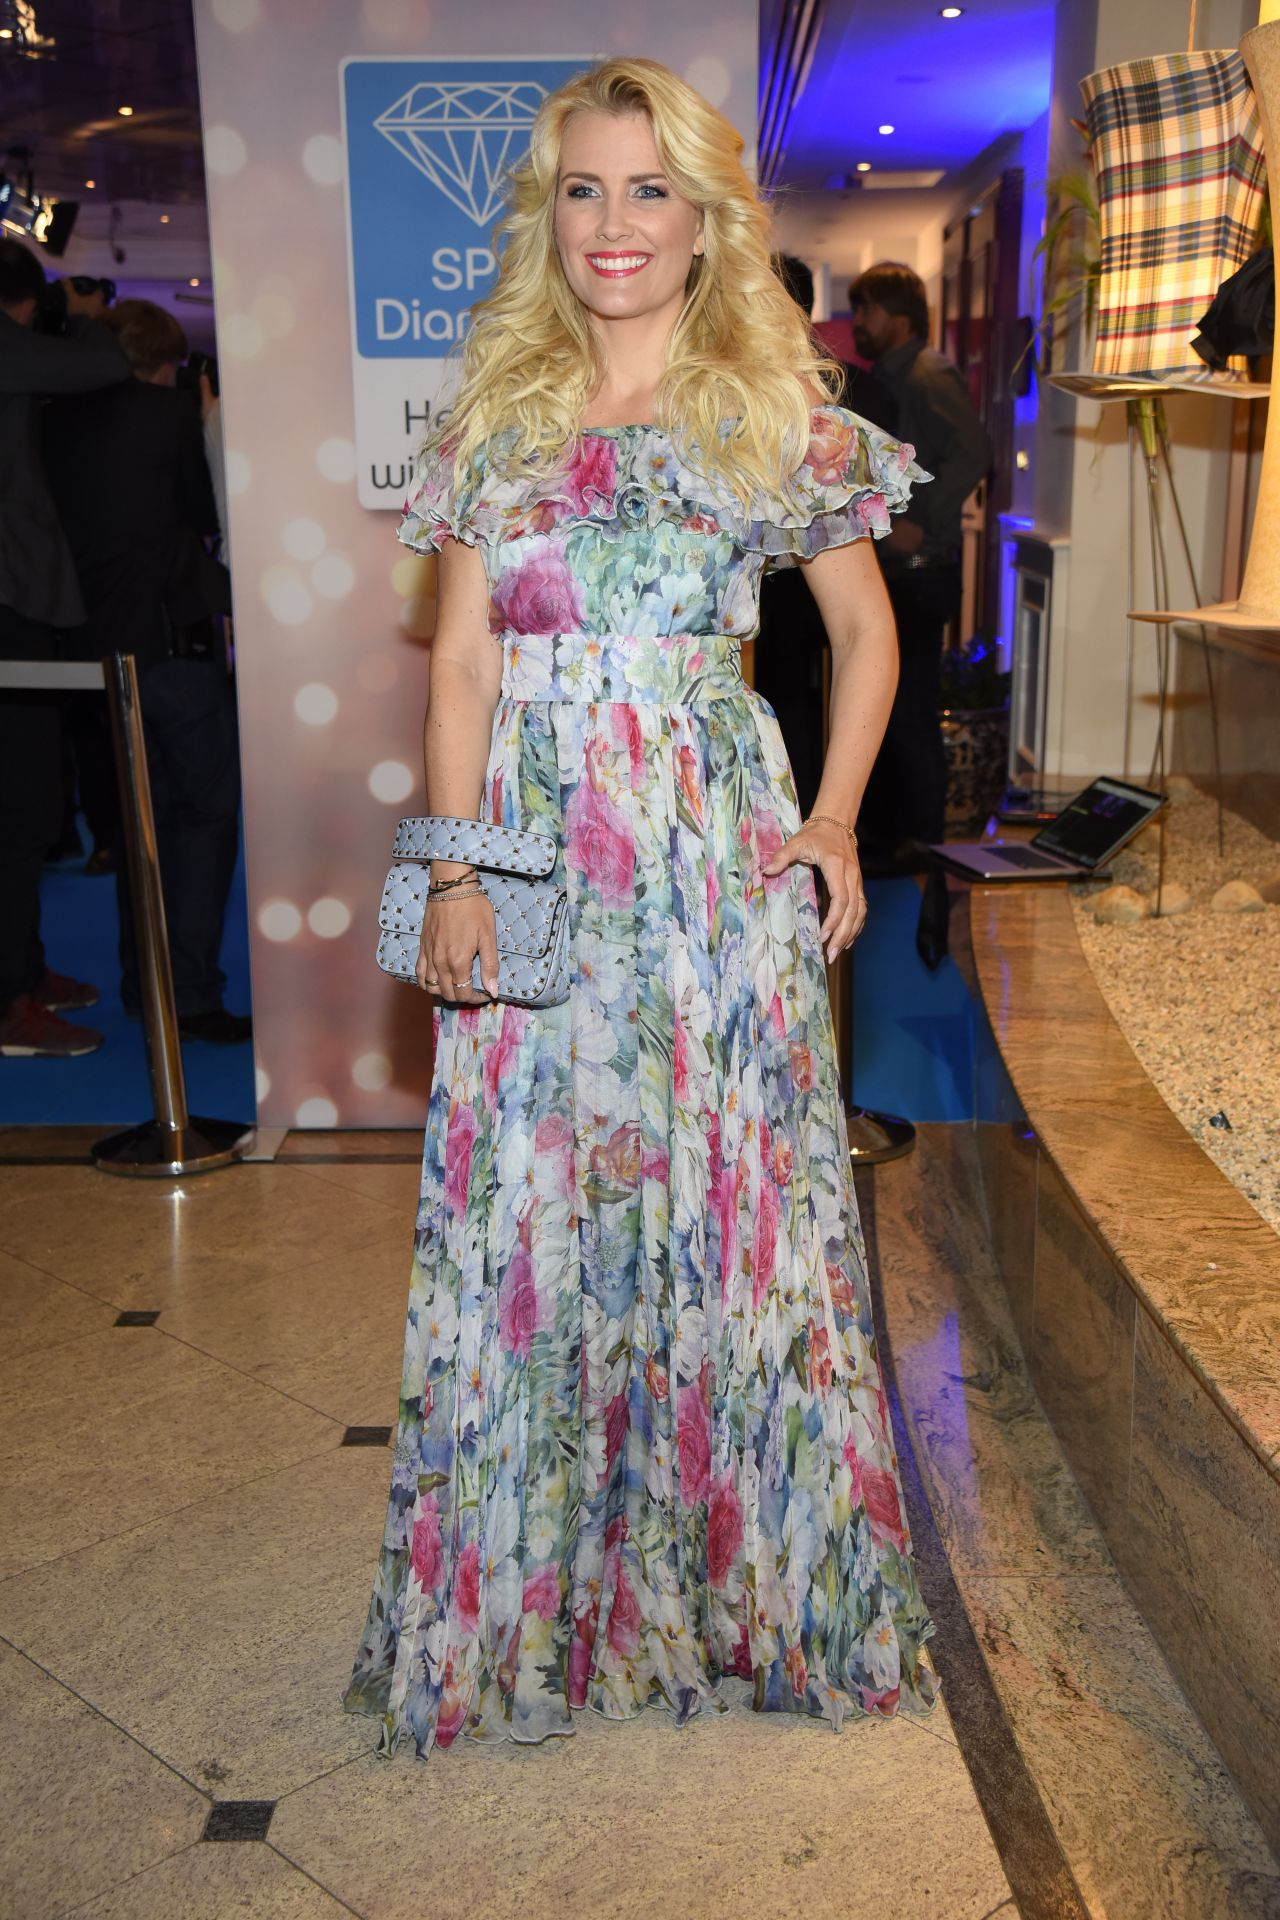 Jennifer knable at riani show mercedes benz fashion week berlin new photo